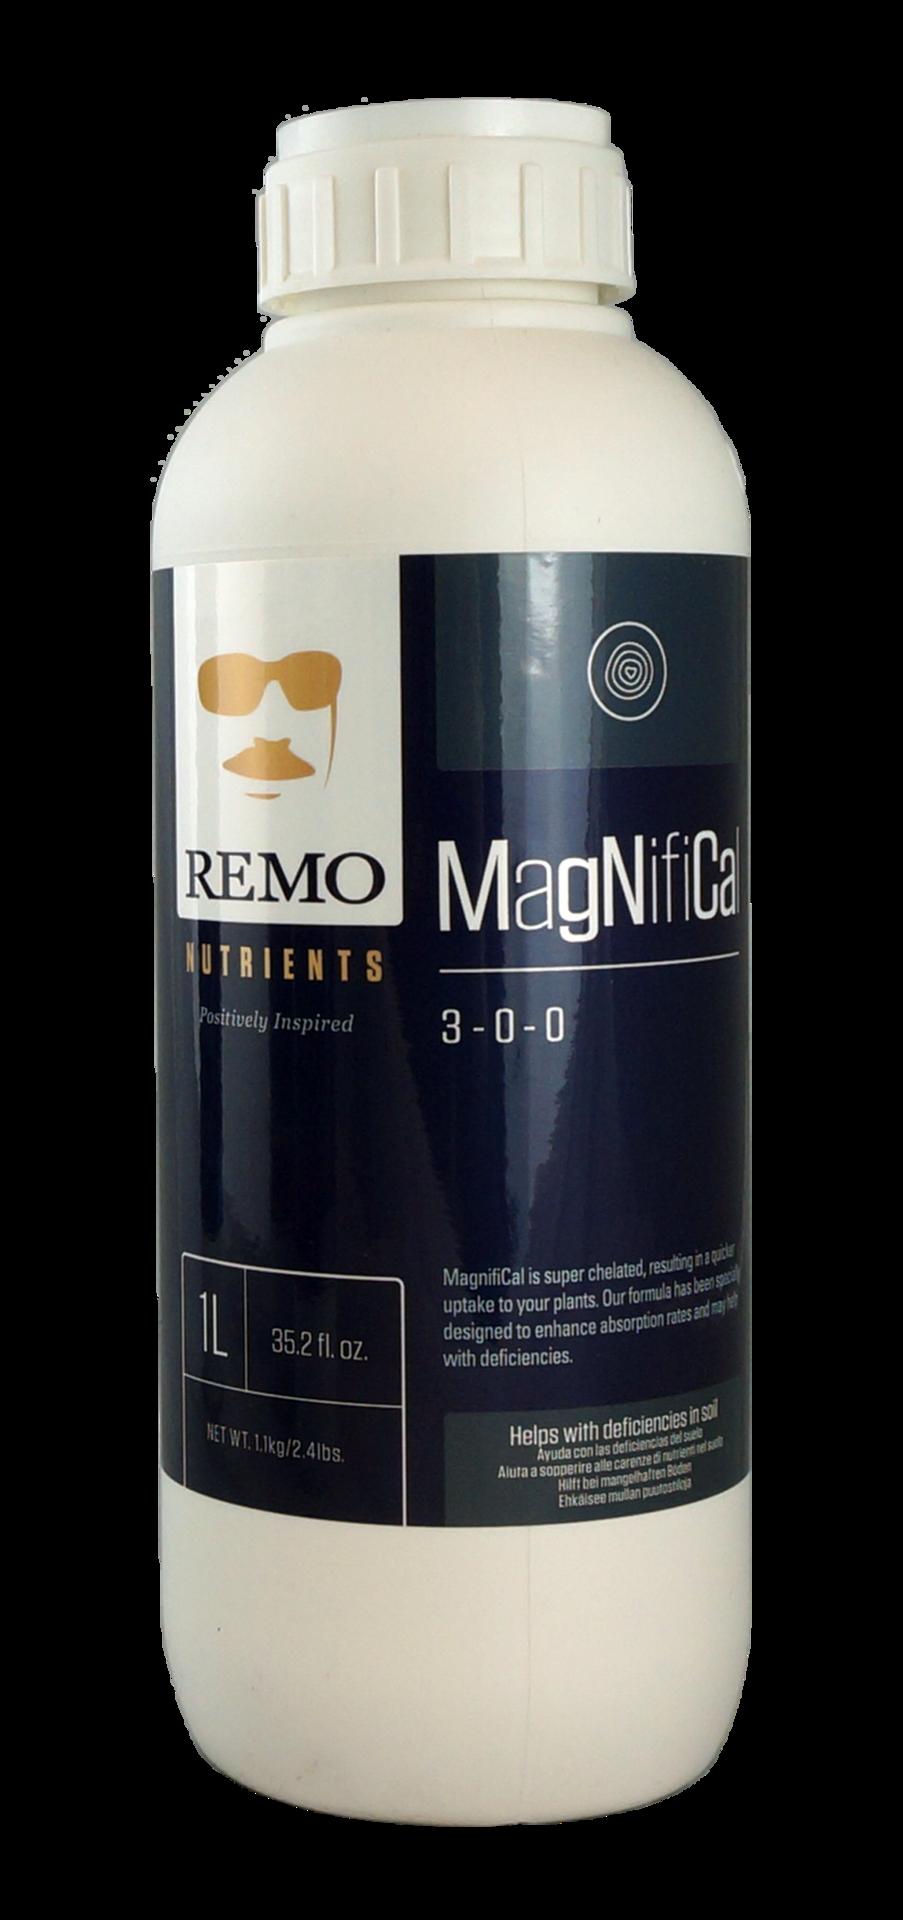 REMO MAGNIFICAL 1 LITRE